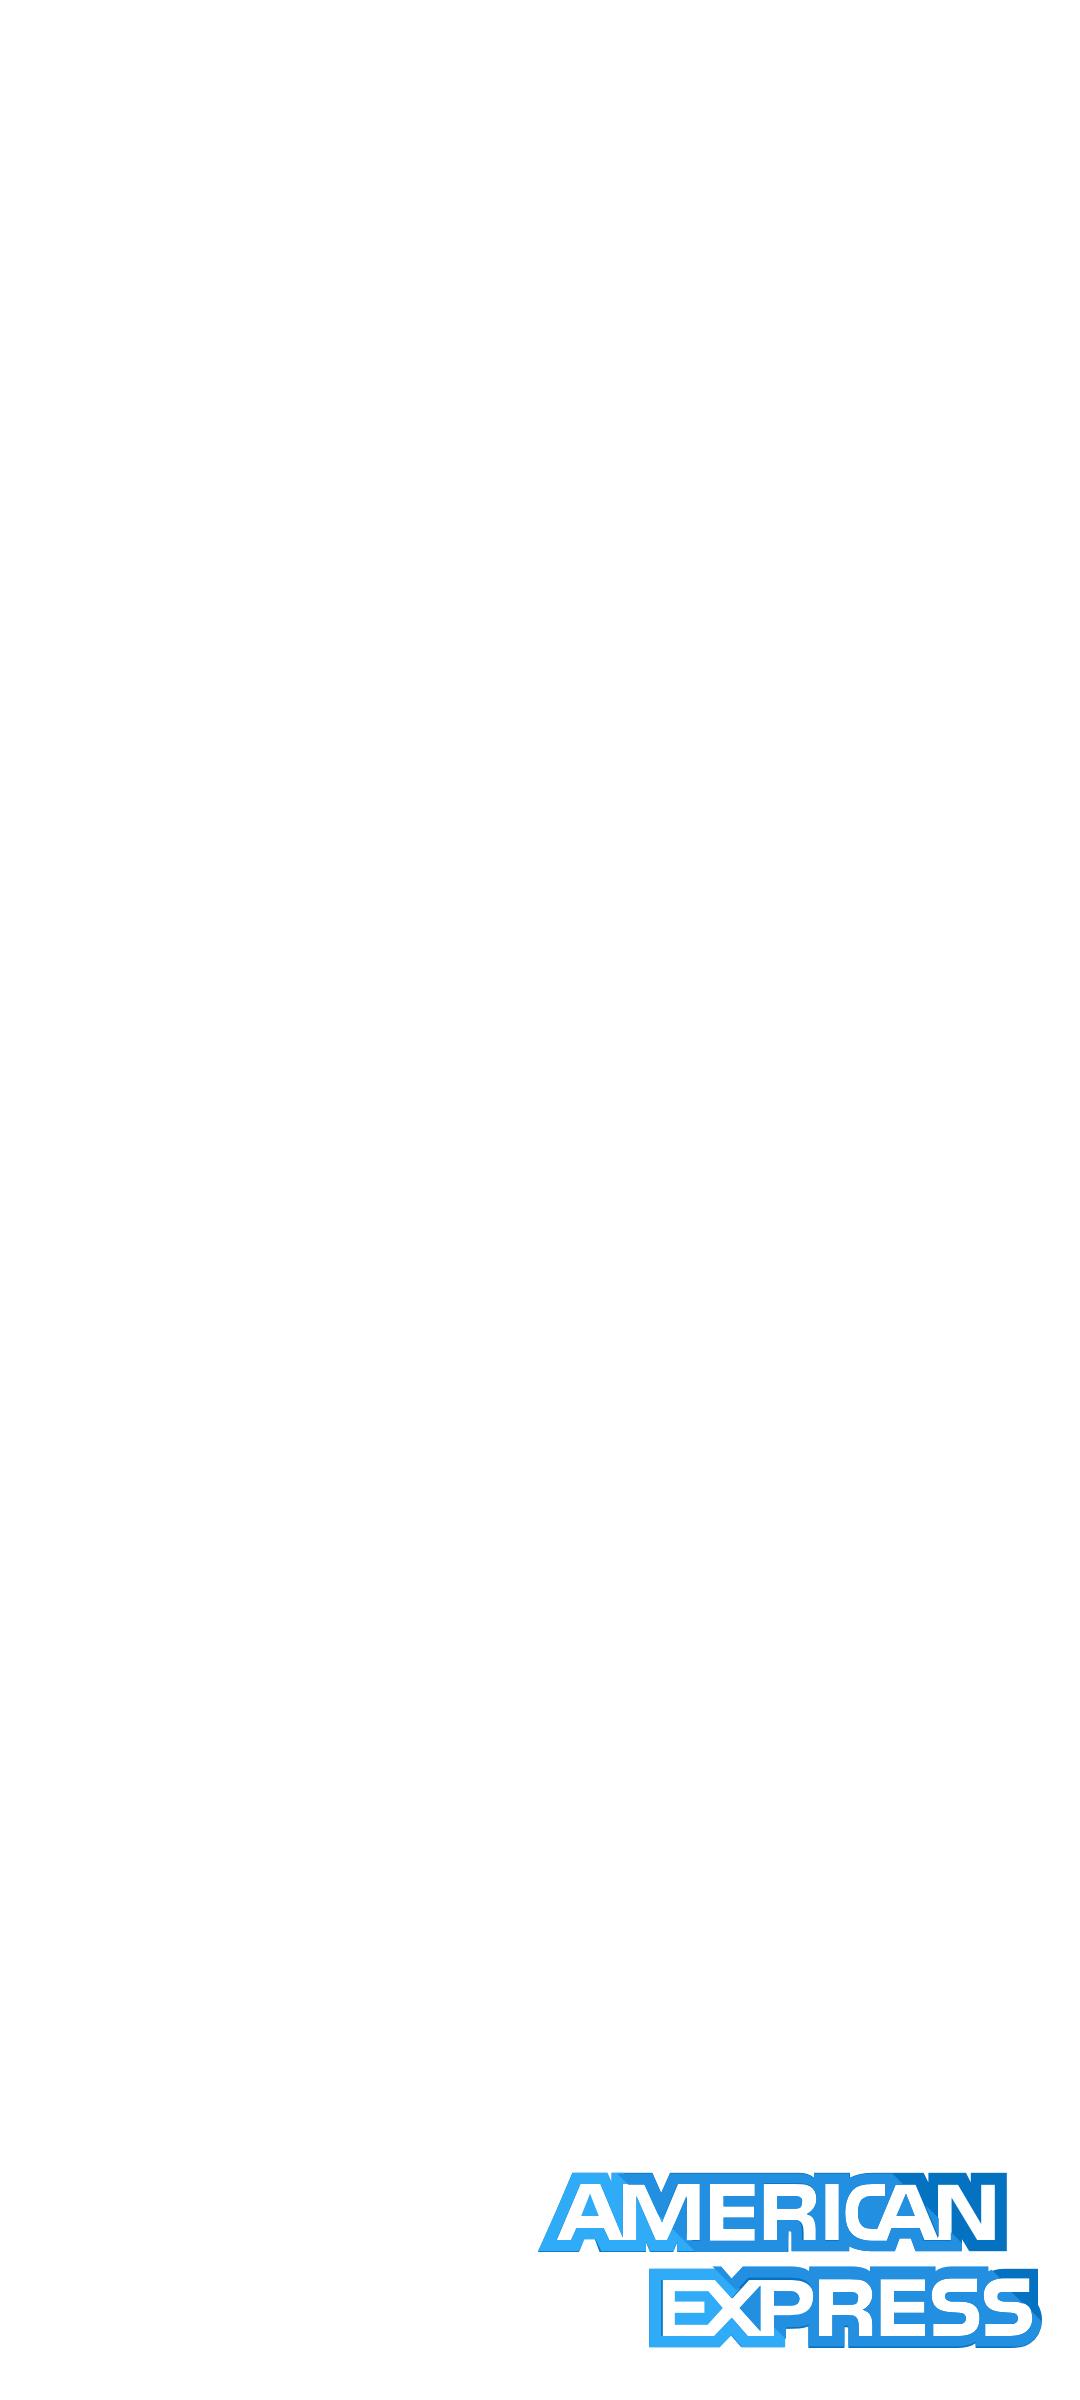 AMERICAN EXPRESS クレジットカード Redmi Note 9S スマホ壁紙・待ち受け